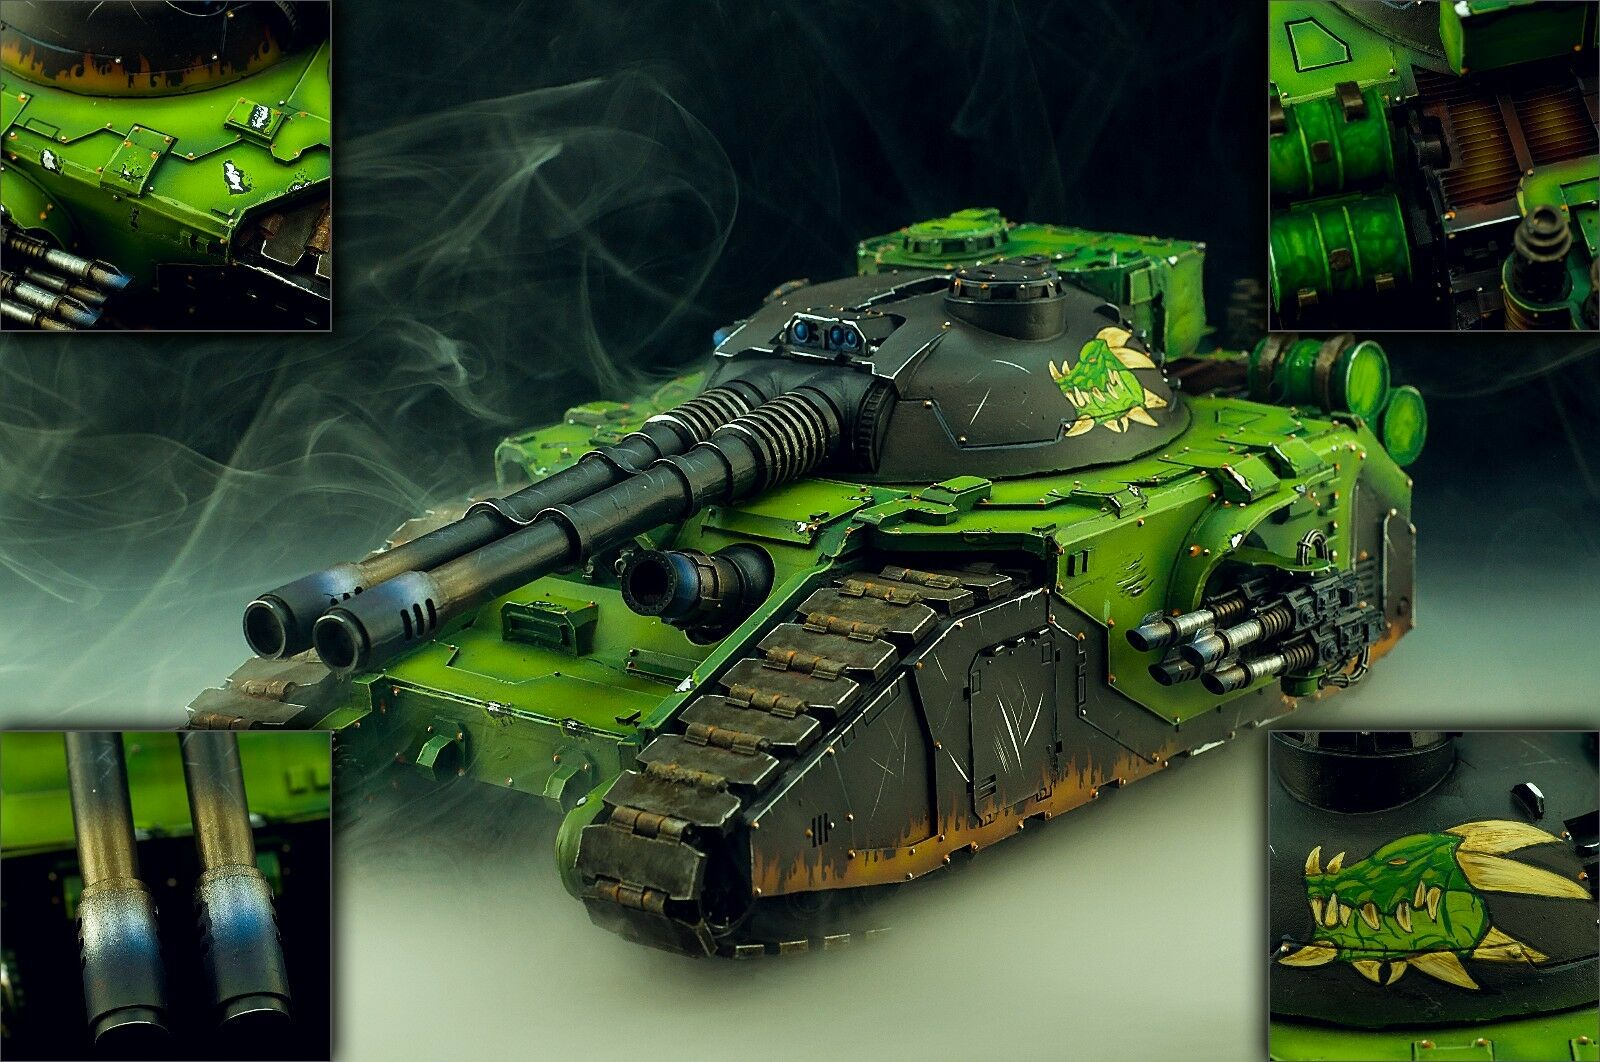 Legion Fellblade - Warhammer 40k 30k Målat Commission